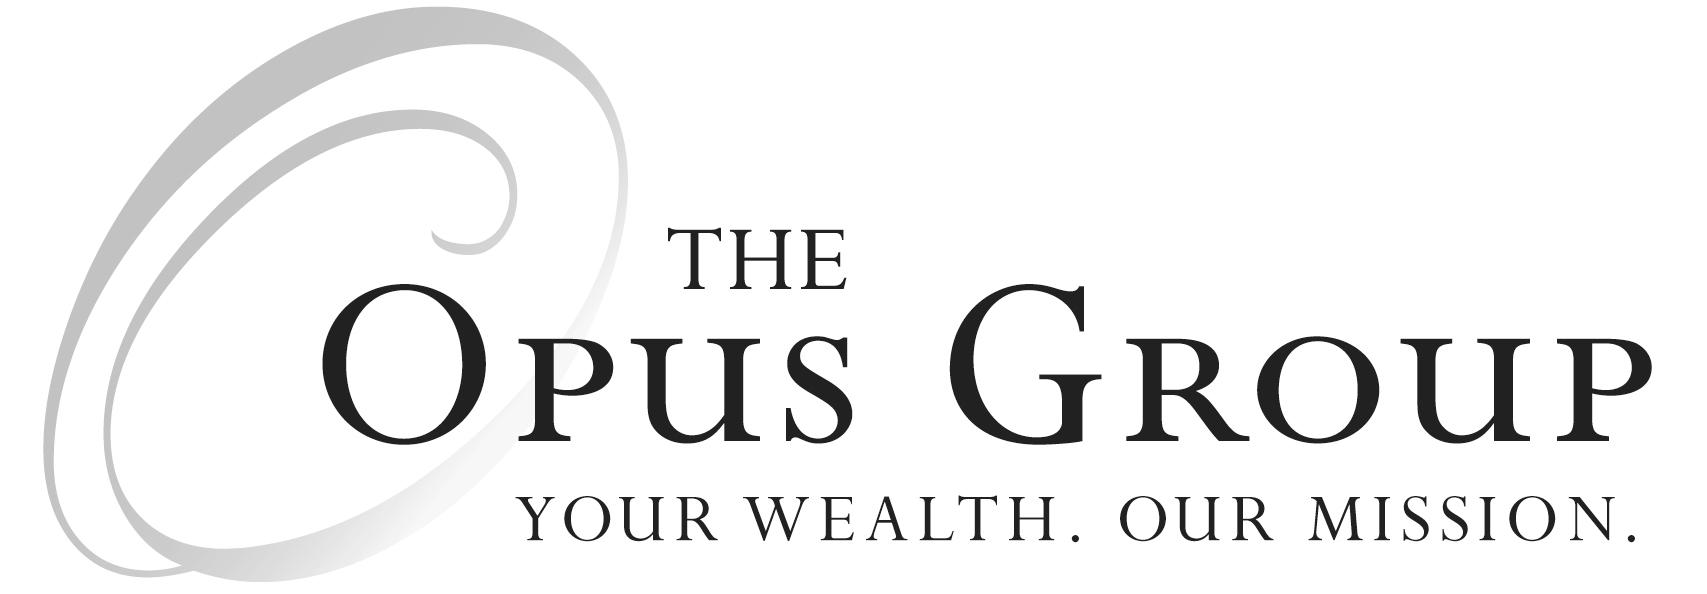 The Opus Group Company Logo